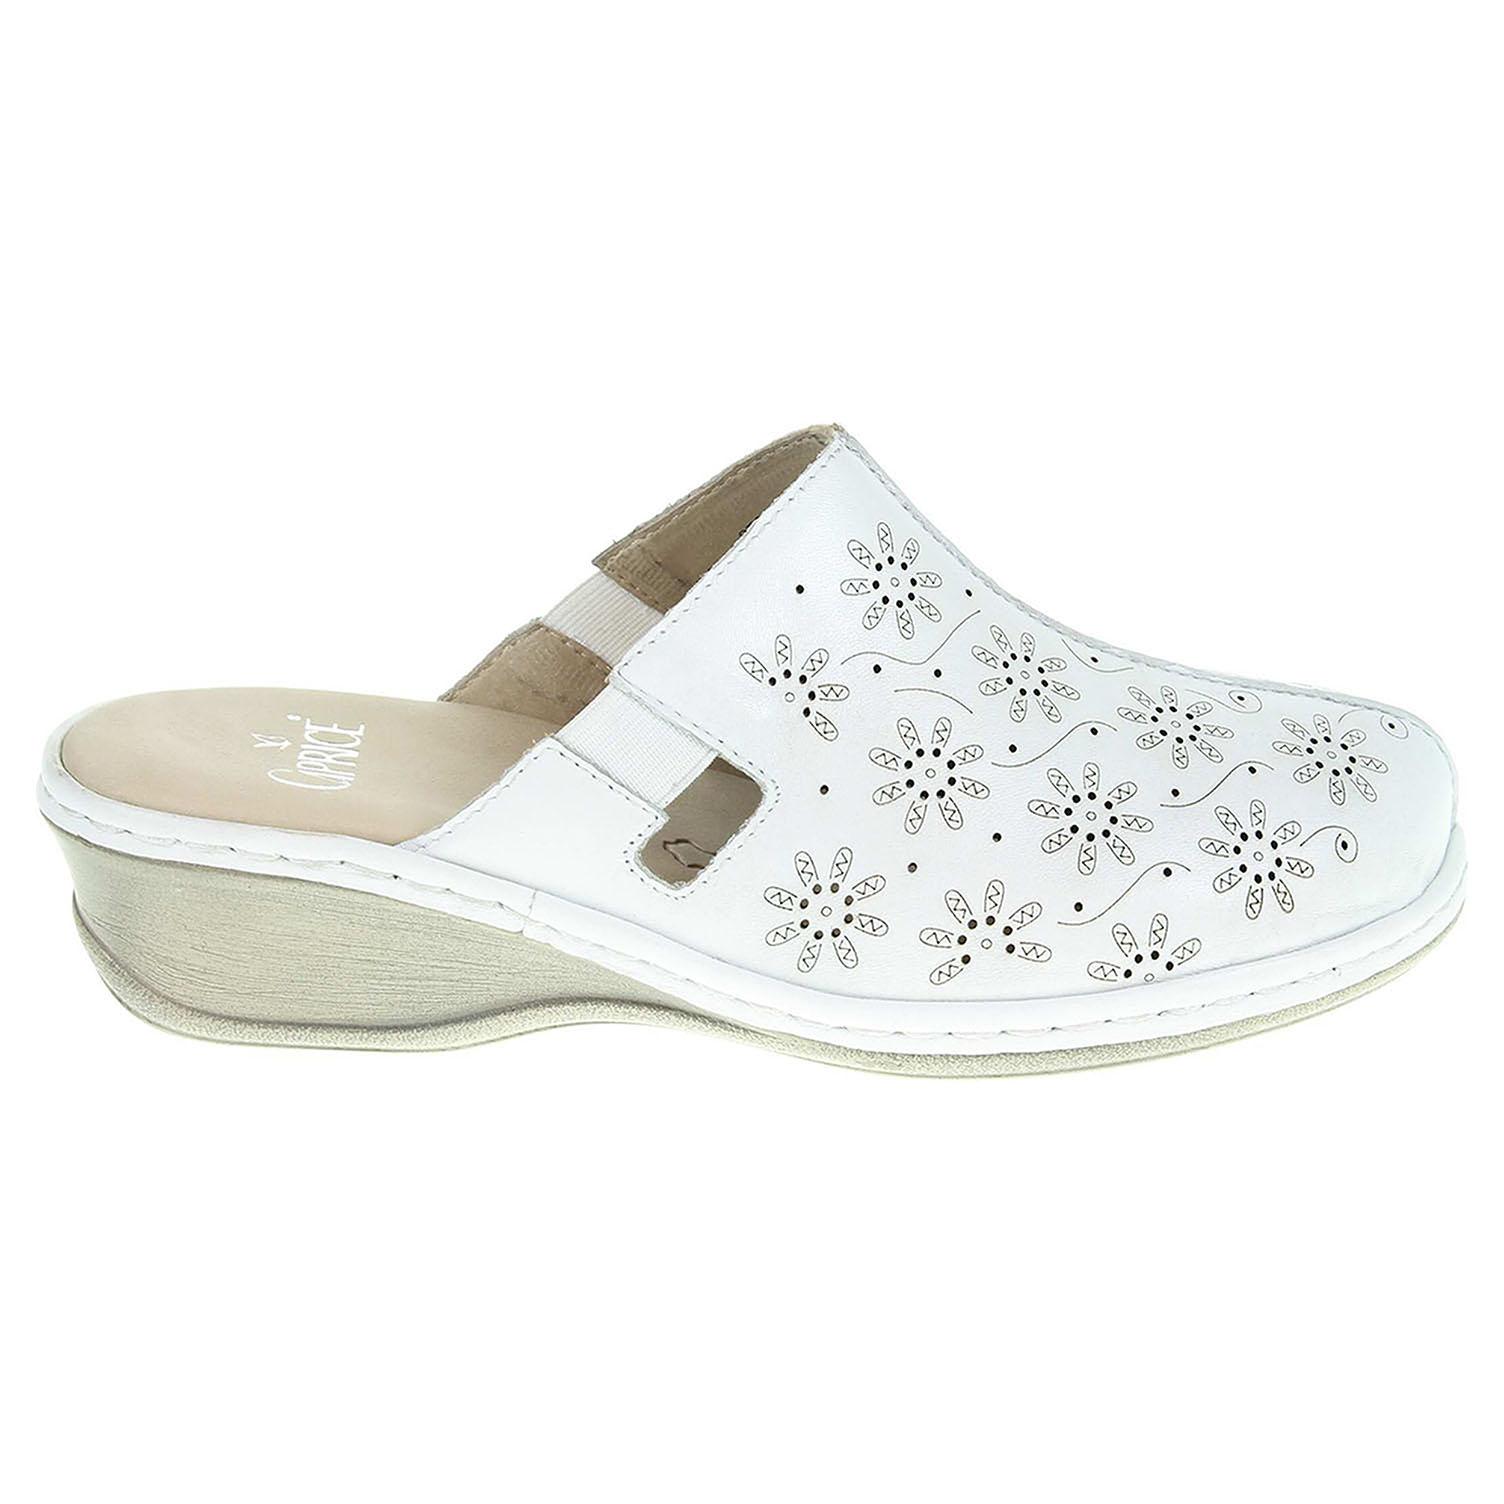 Ecco Caprice dámské pantofle 9-27350-28 bílé 23600803